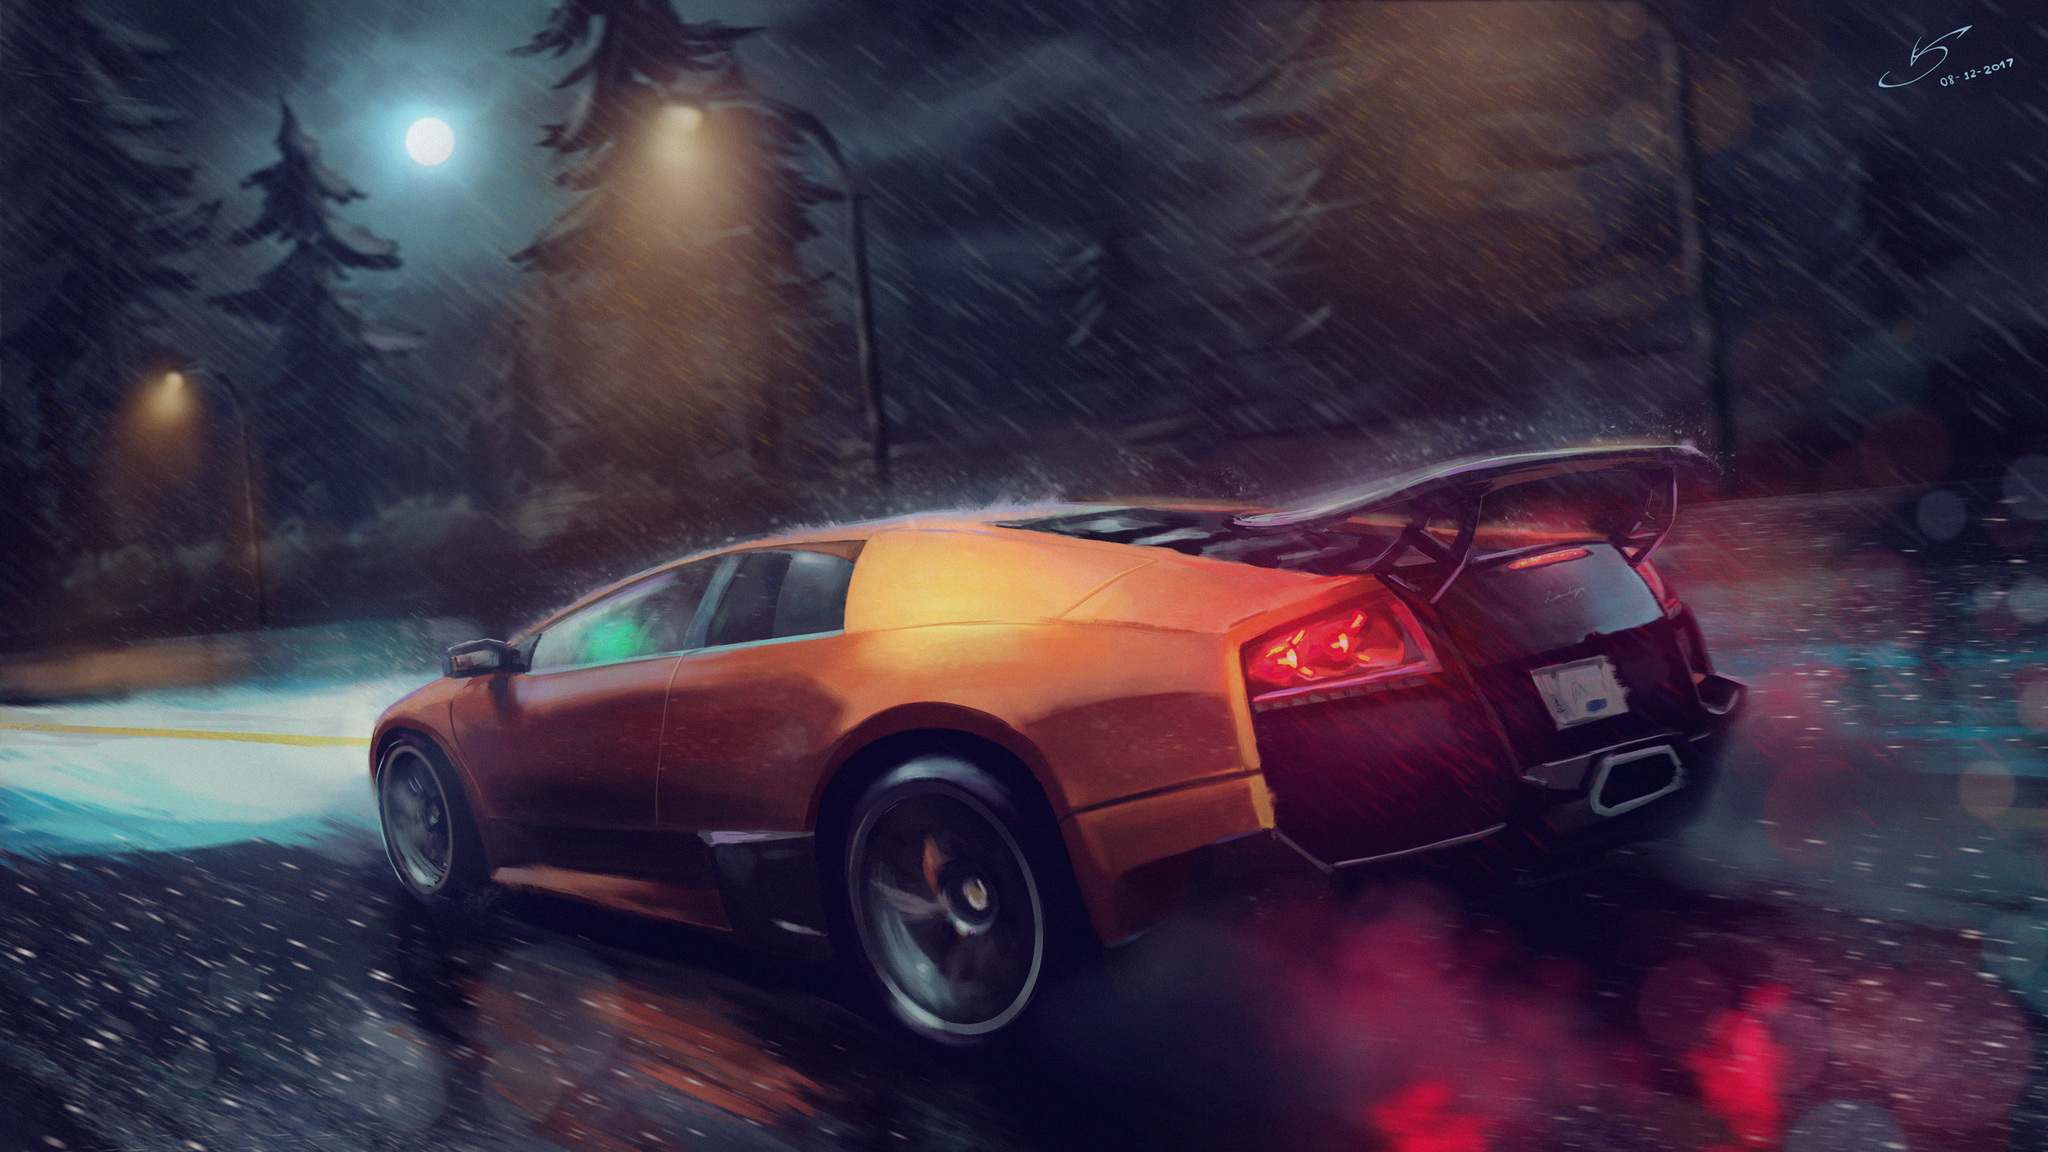 2048x1152 Lamborghini Murcielago Sv Digital Art 2048x1152 Resolution